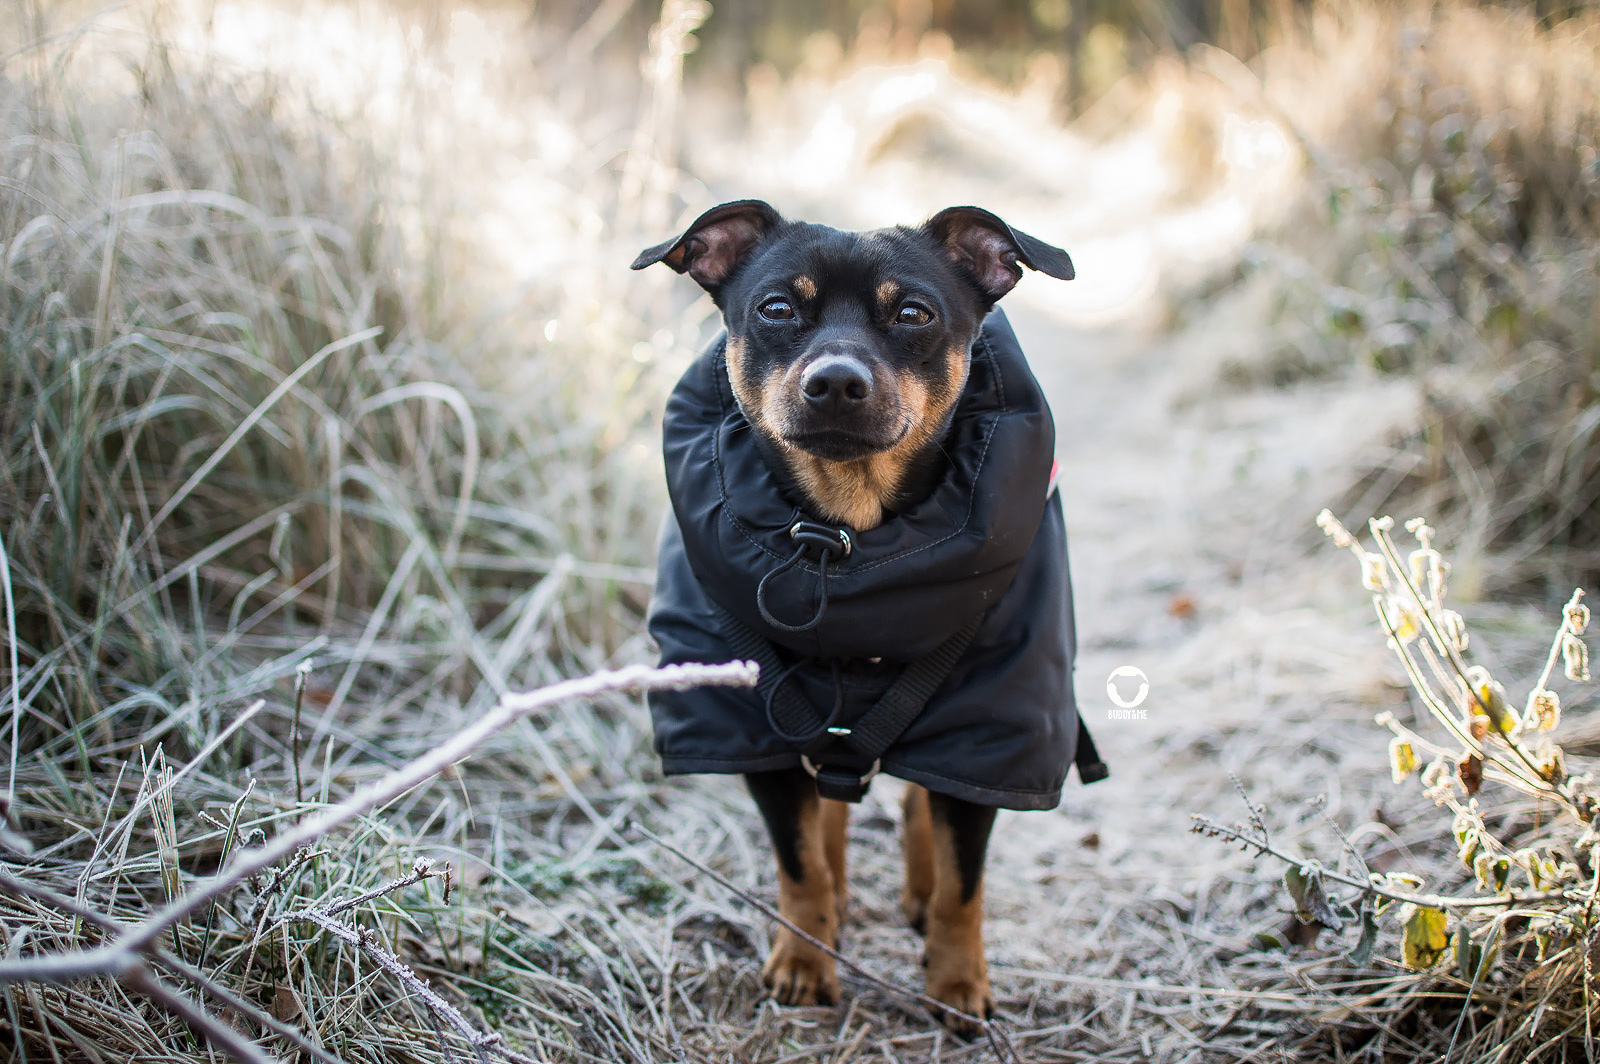 Pinscher Buddy, Buddy and Me, Hundeblog, Dogblog, Ruhrgebiet, Leben mit Hund, Hundealltag, Frost, Winter